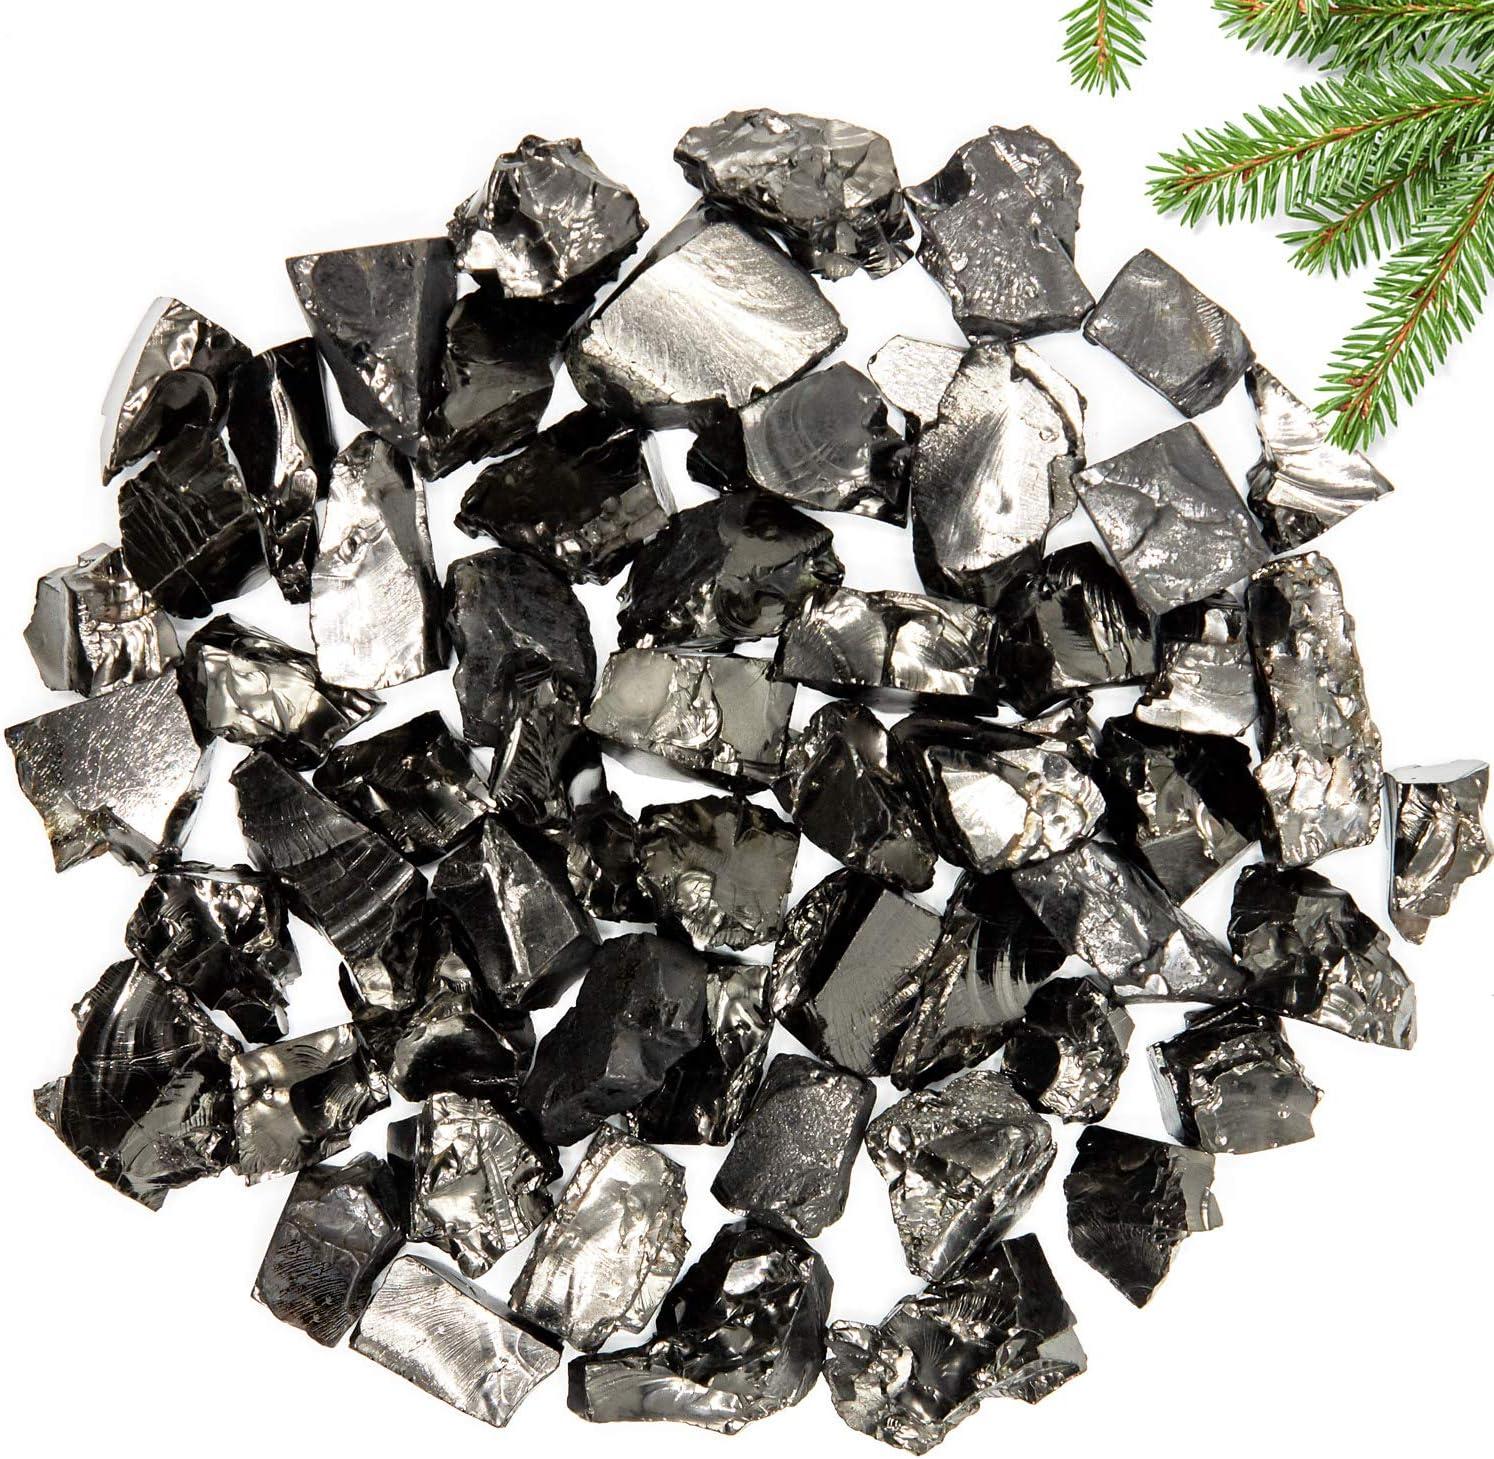 Elite Shungite Detoxification Stone 0,22 Lb/100 gr for Water & Jewelry Making - #A 0,03-0,1 Oz Per One Shungite Stone